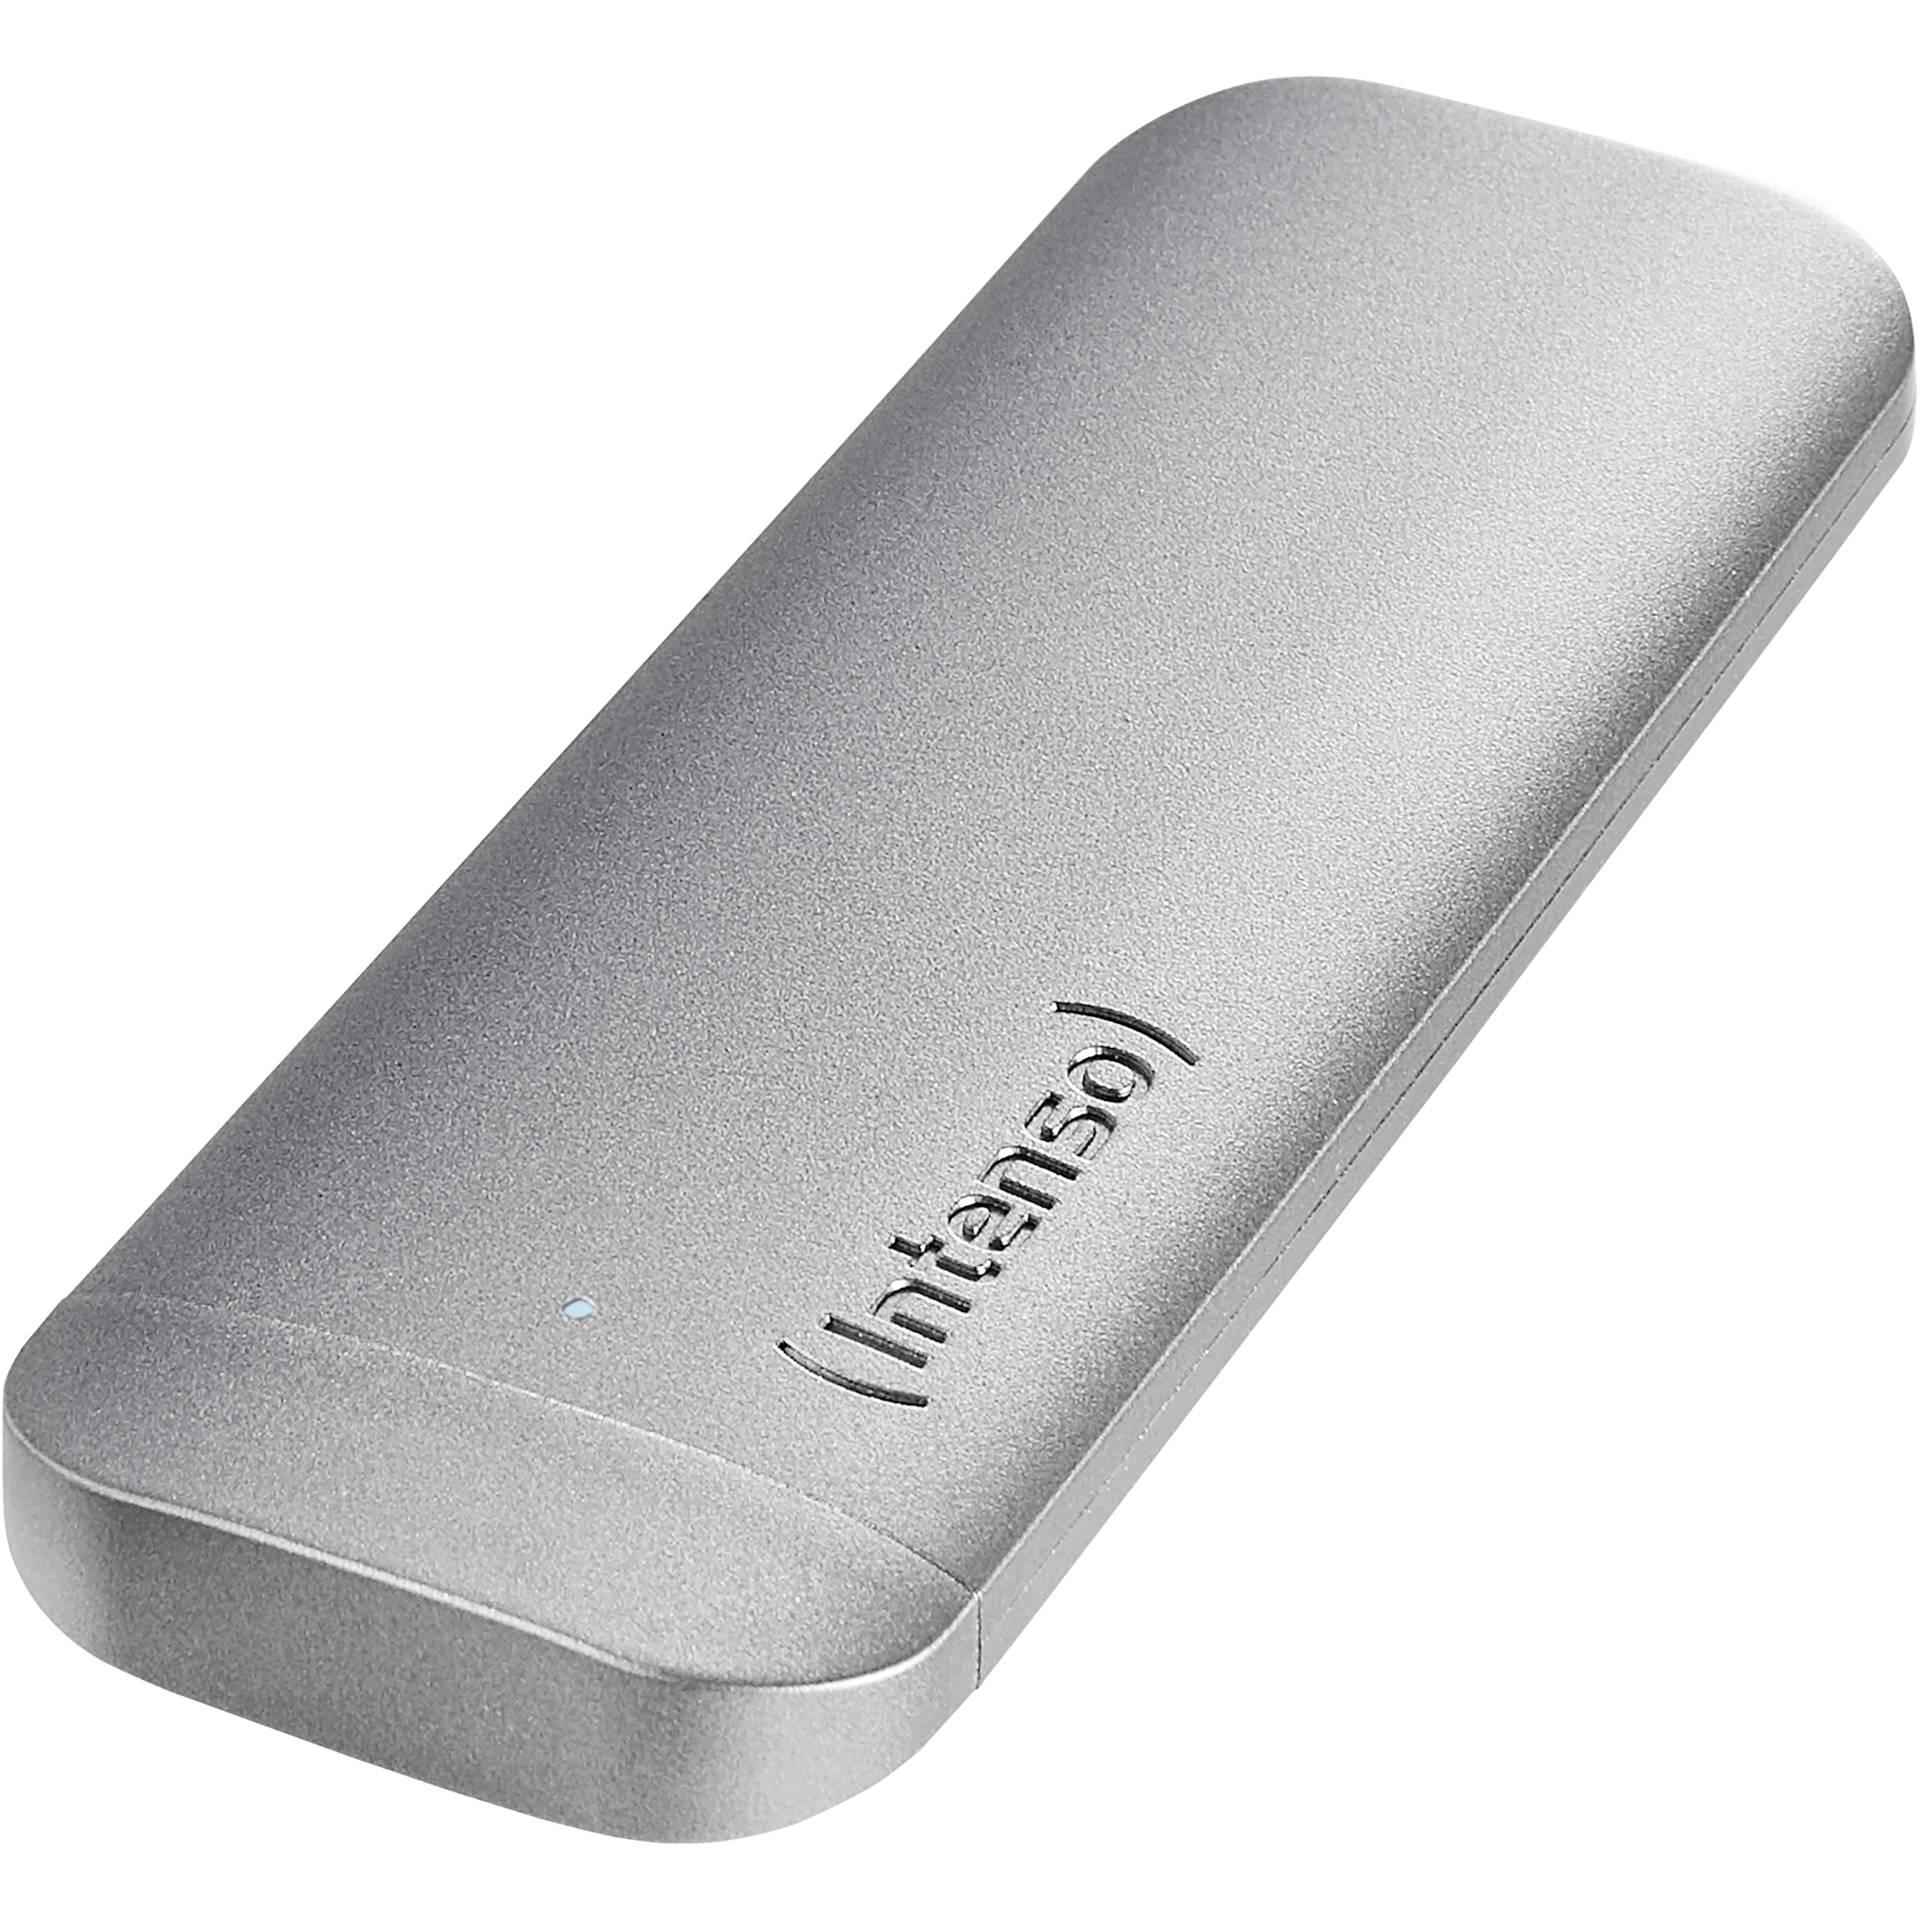 Intenso externe SSD 120GB USB 3.1 Gen.1 Type C Business